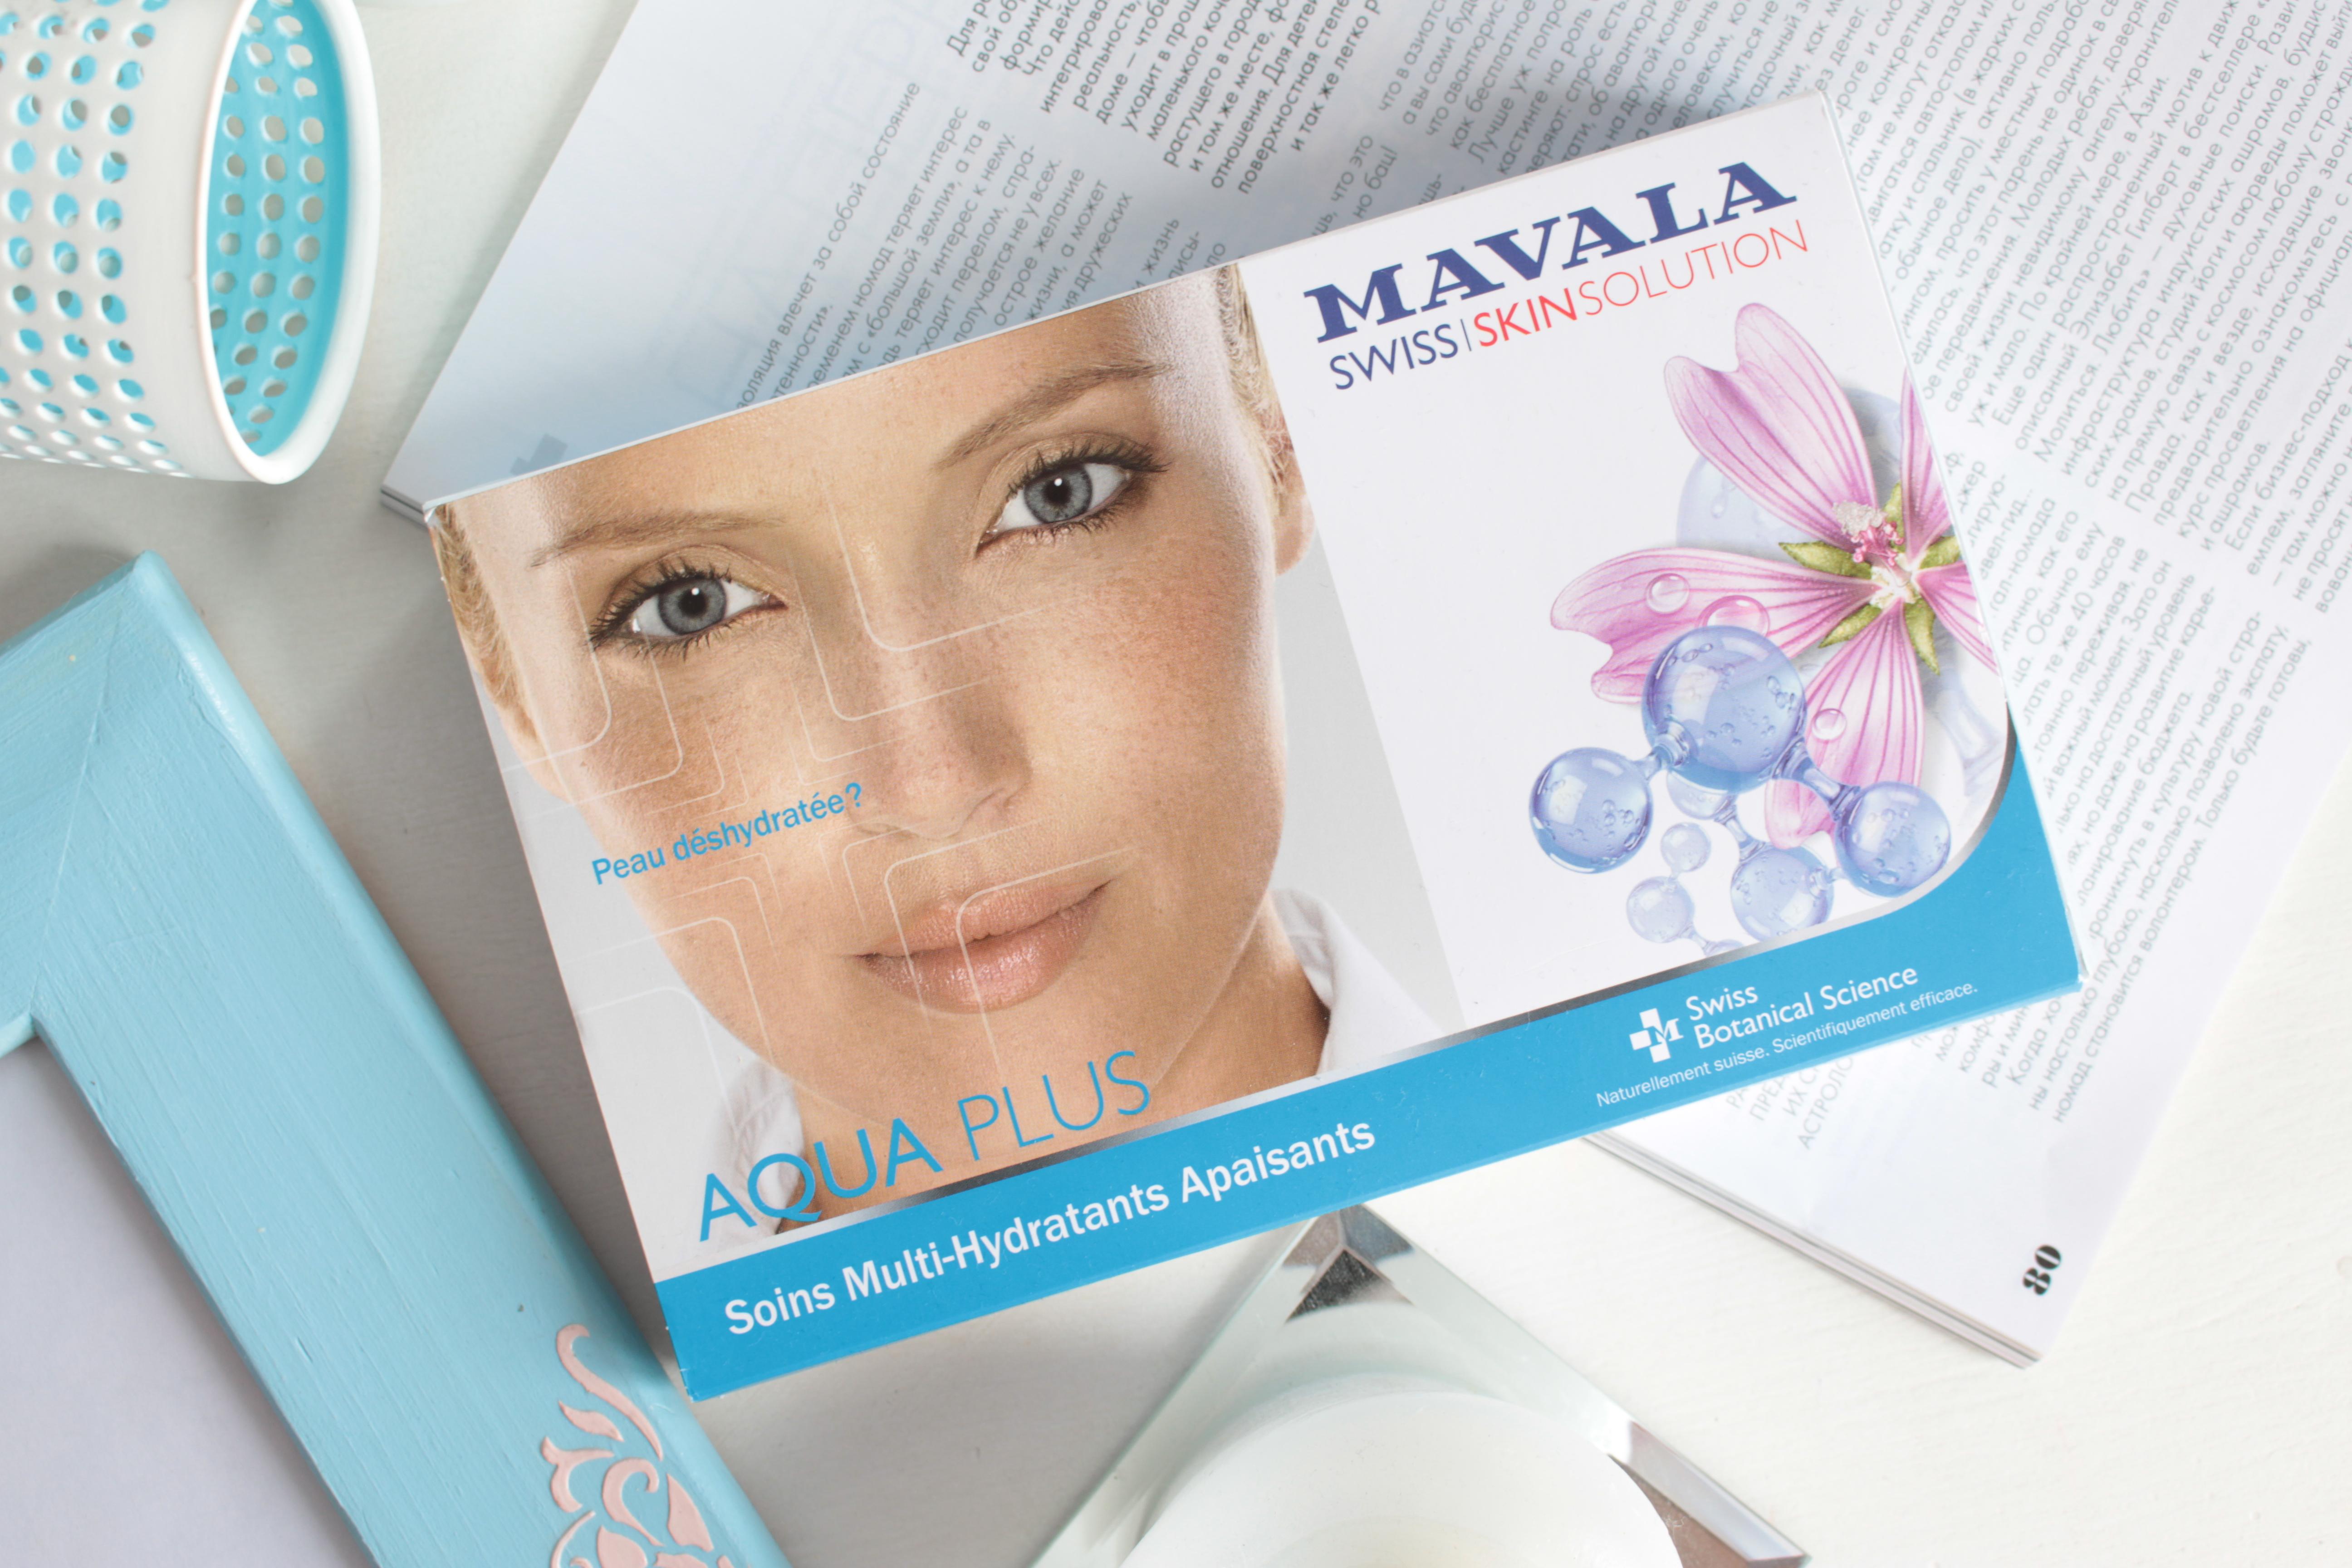 Mavala Swiss Skin Solution